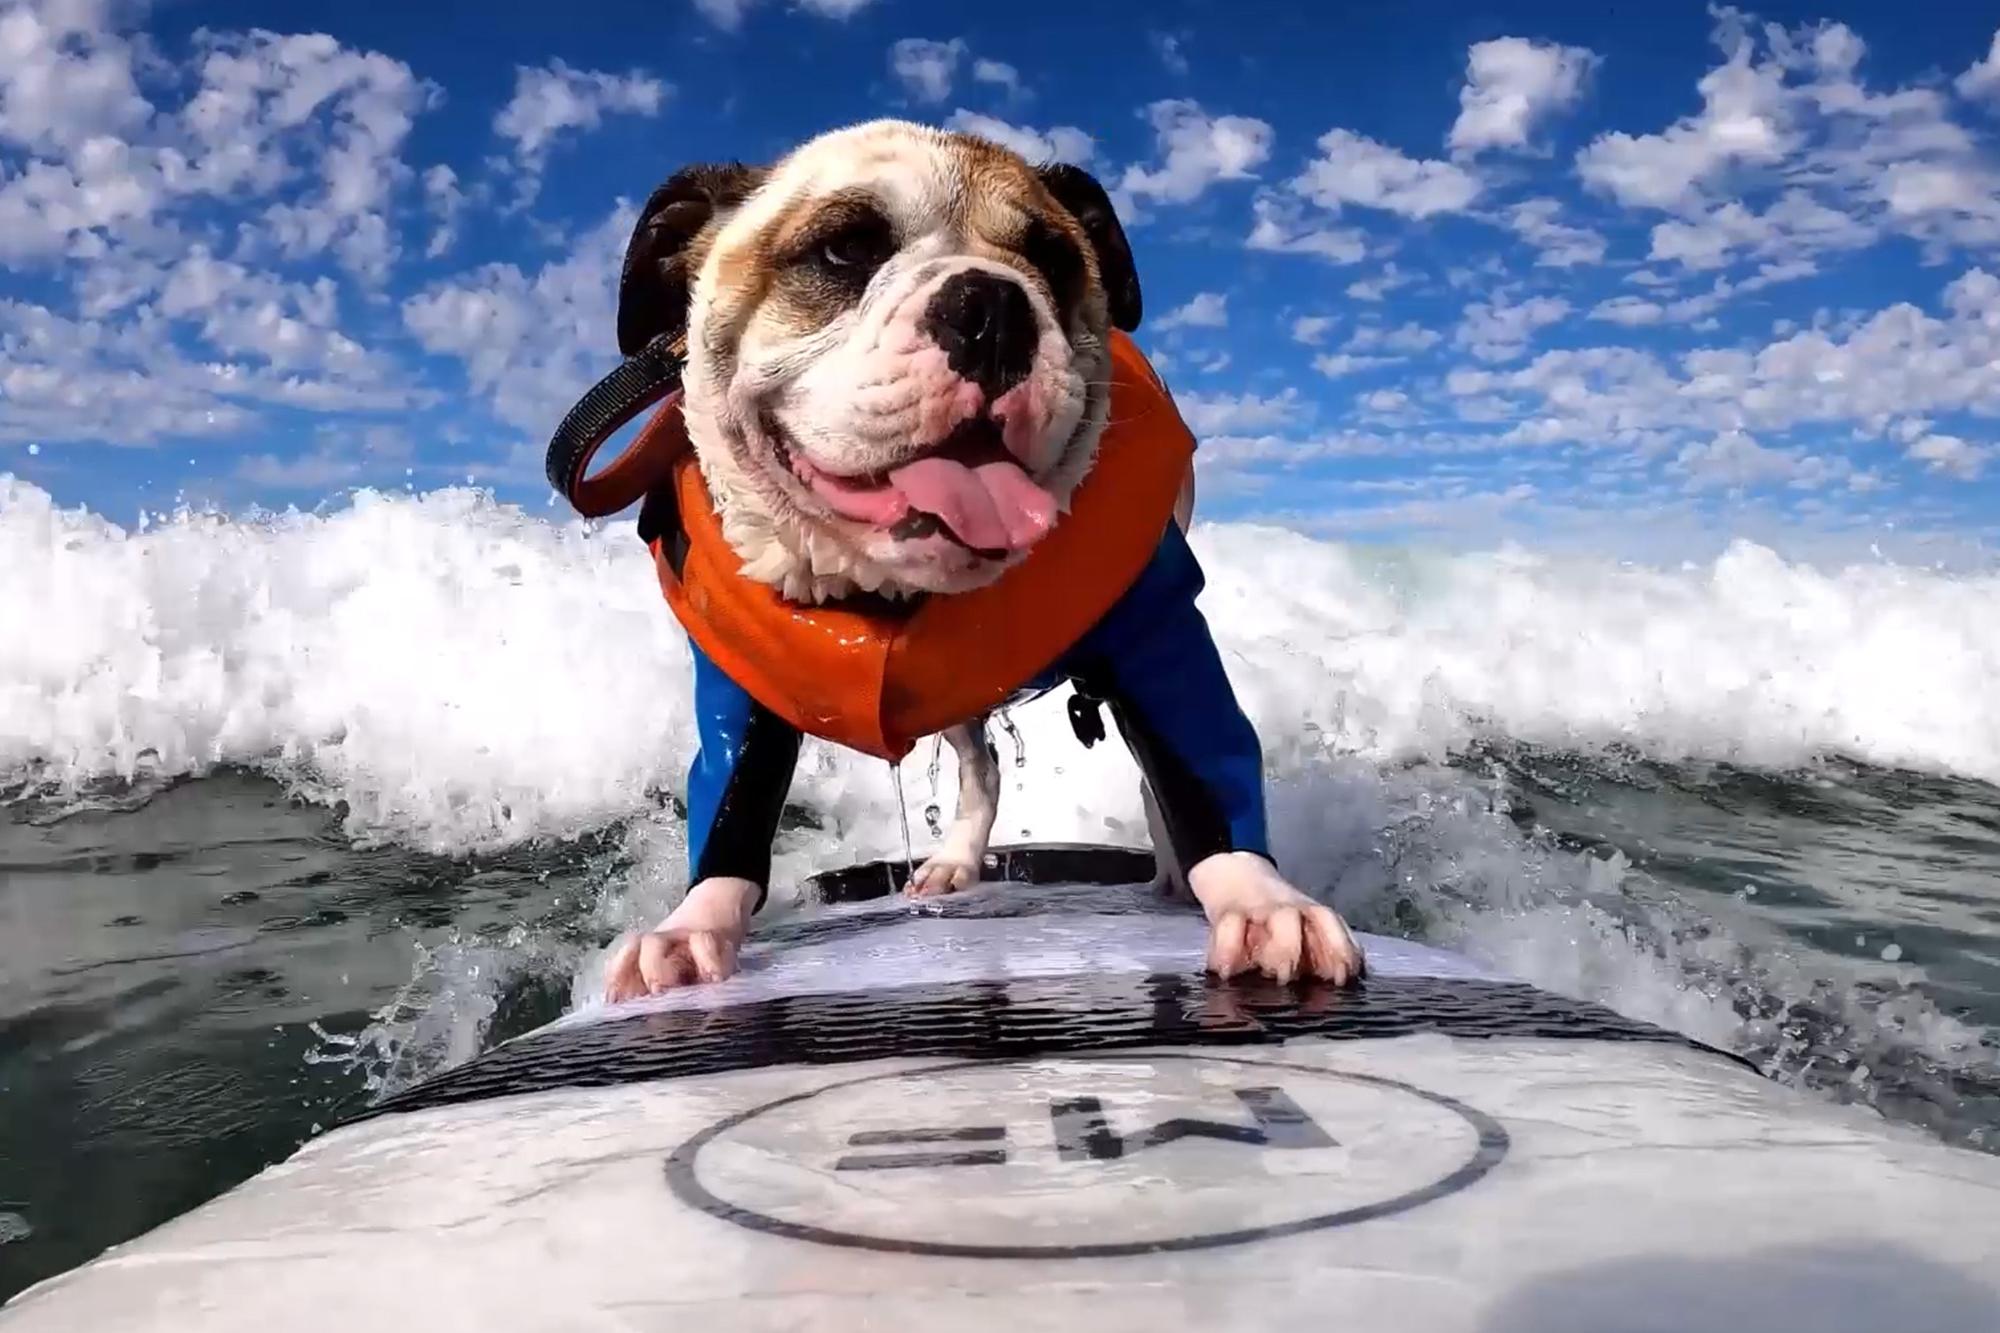 Surfing bulldog hangs ten in San Diego